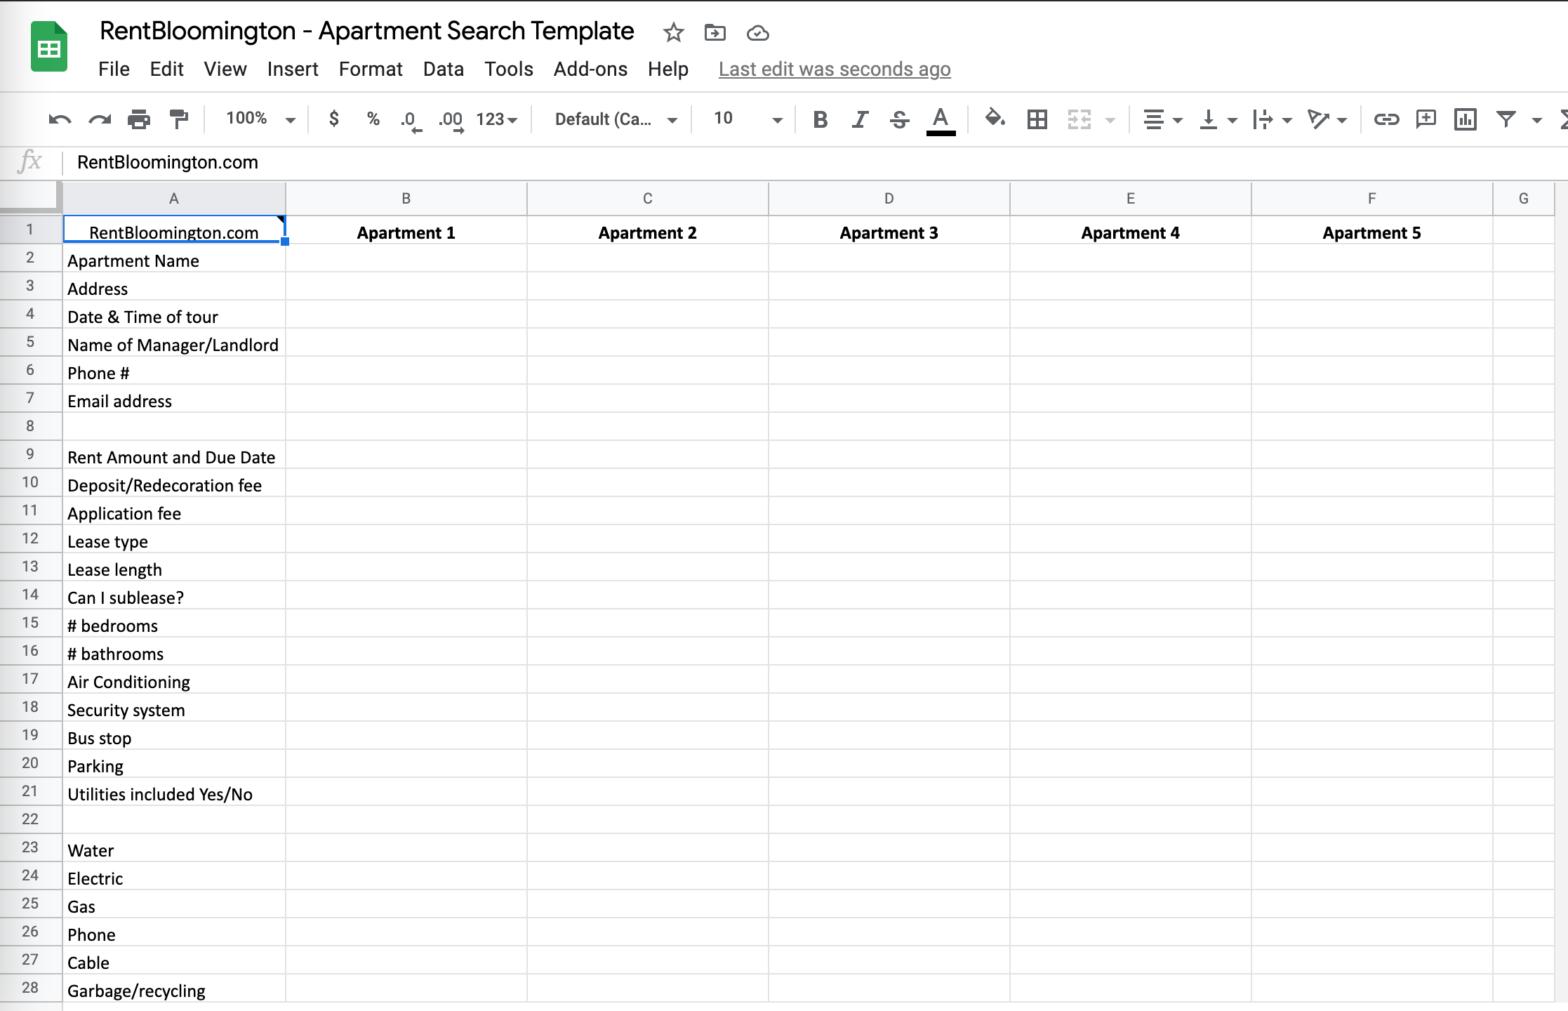 Rent Bloomington - Apartment Search Template Google Spreadsheet